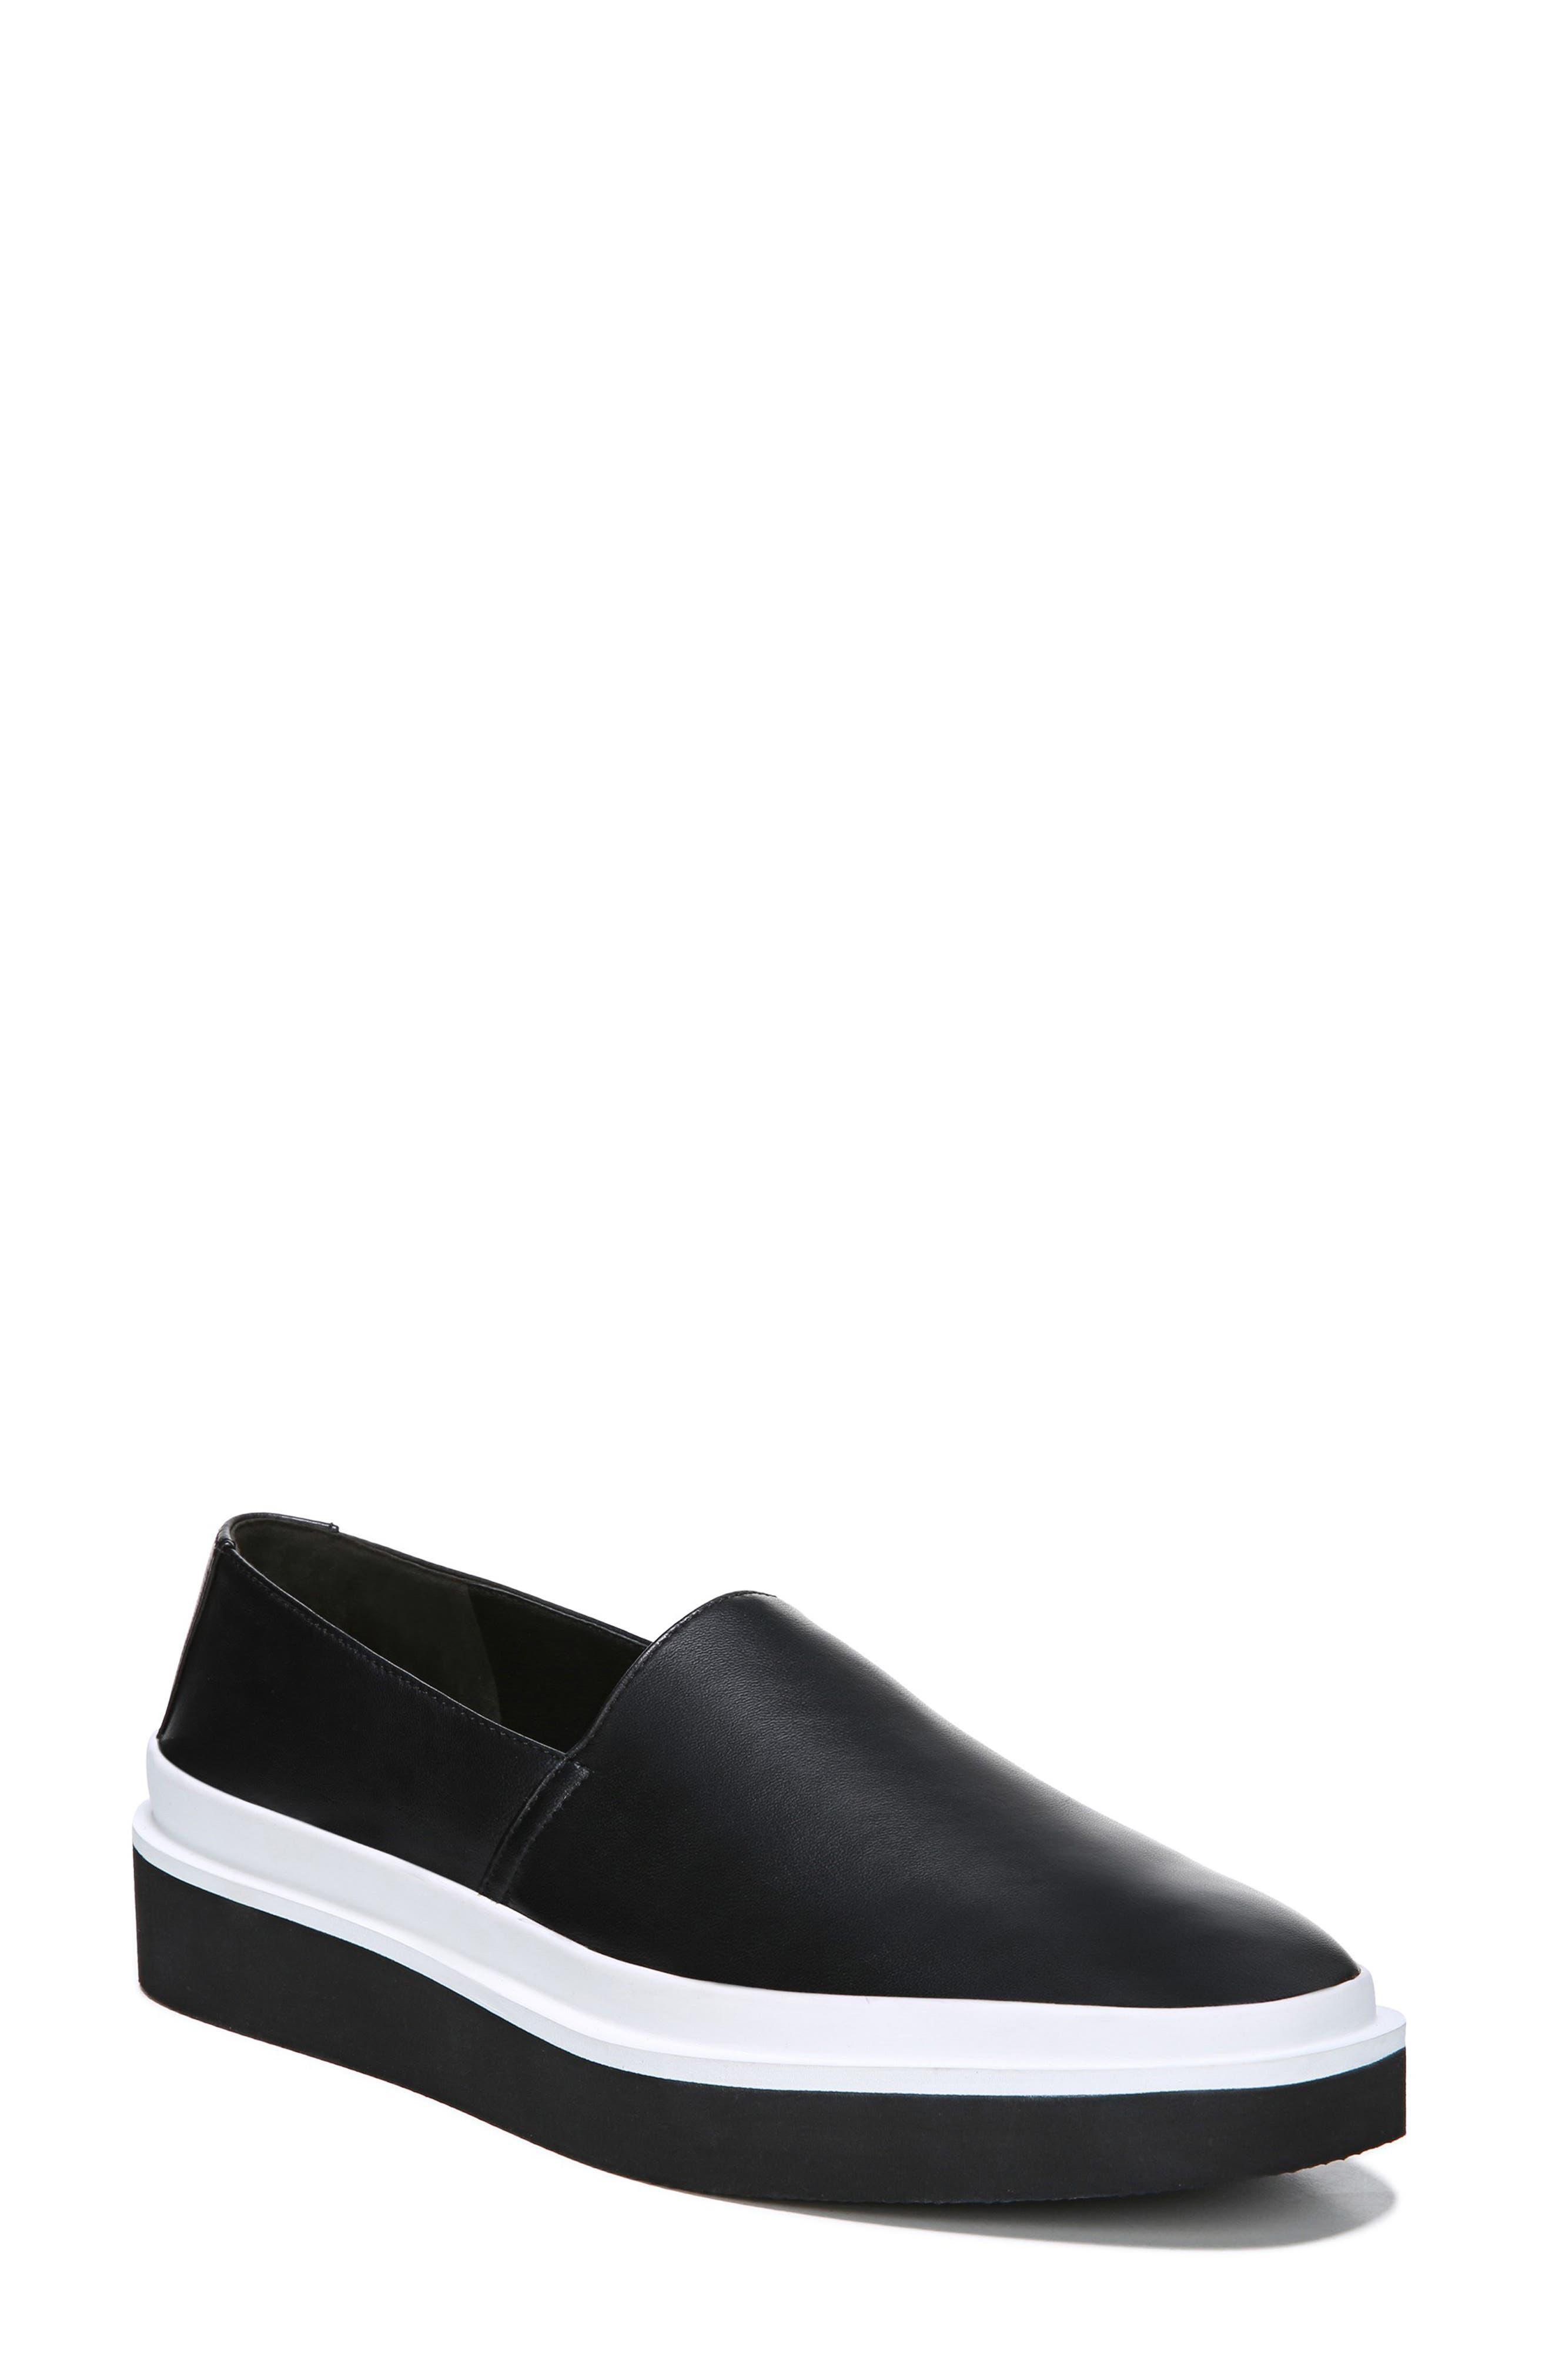 Travis Slip-on Sneaker,                             Main thumbnail 1, color,                             BLACK